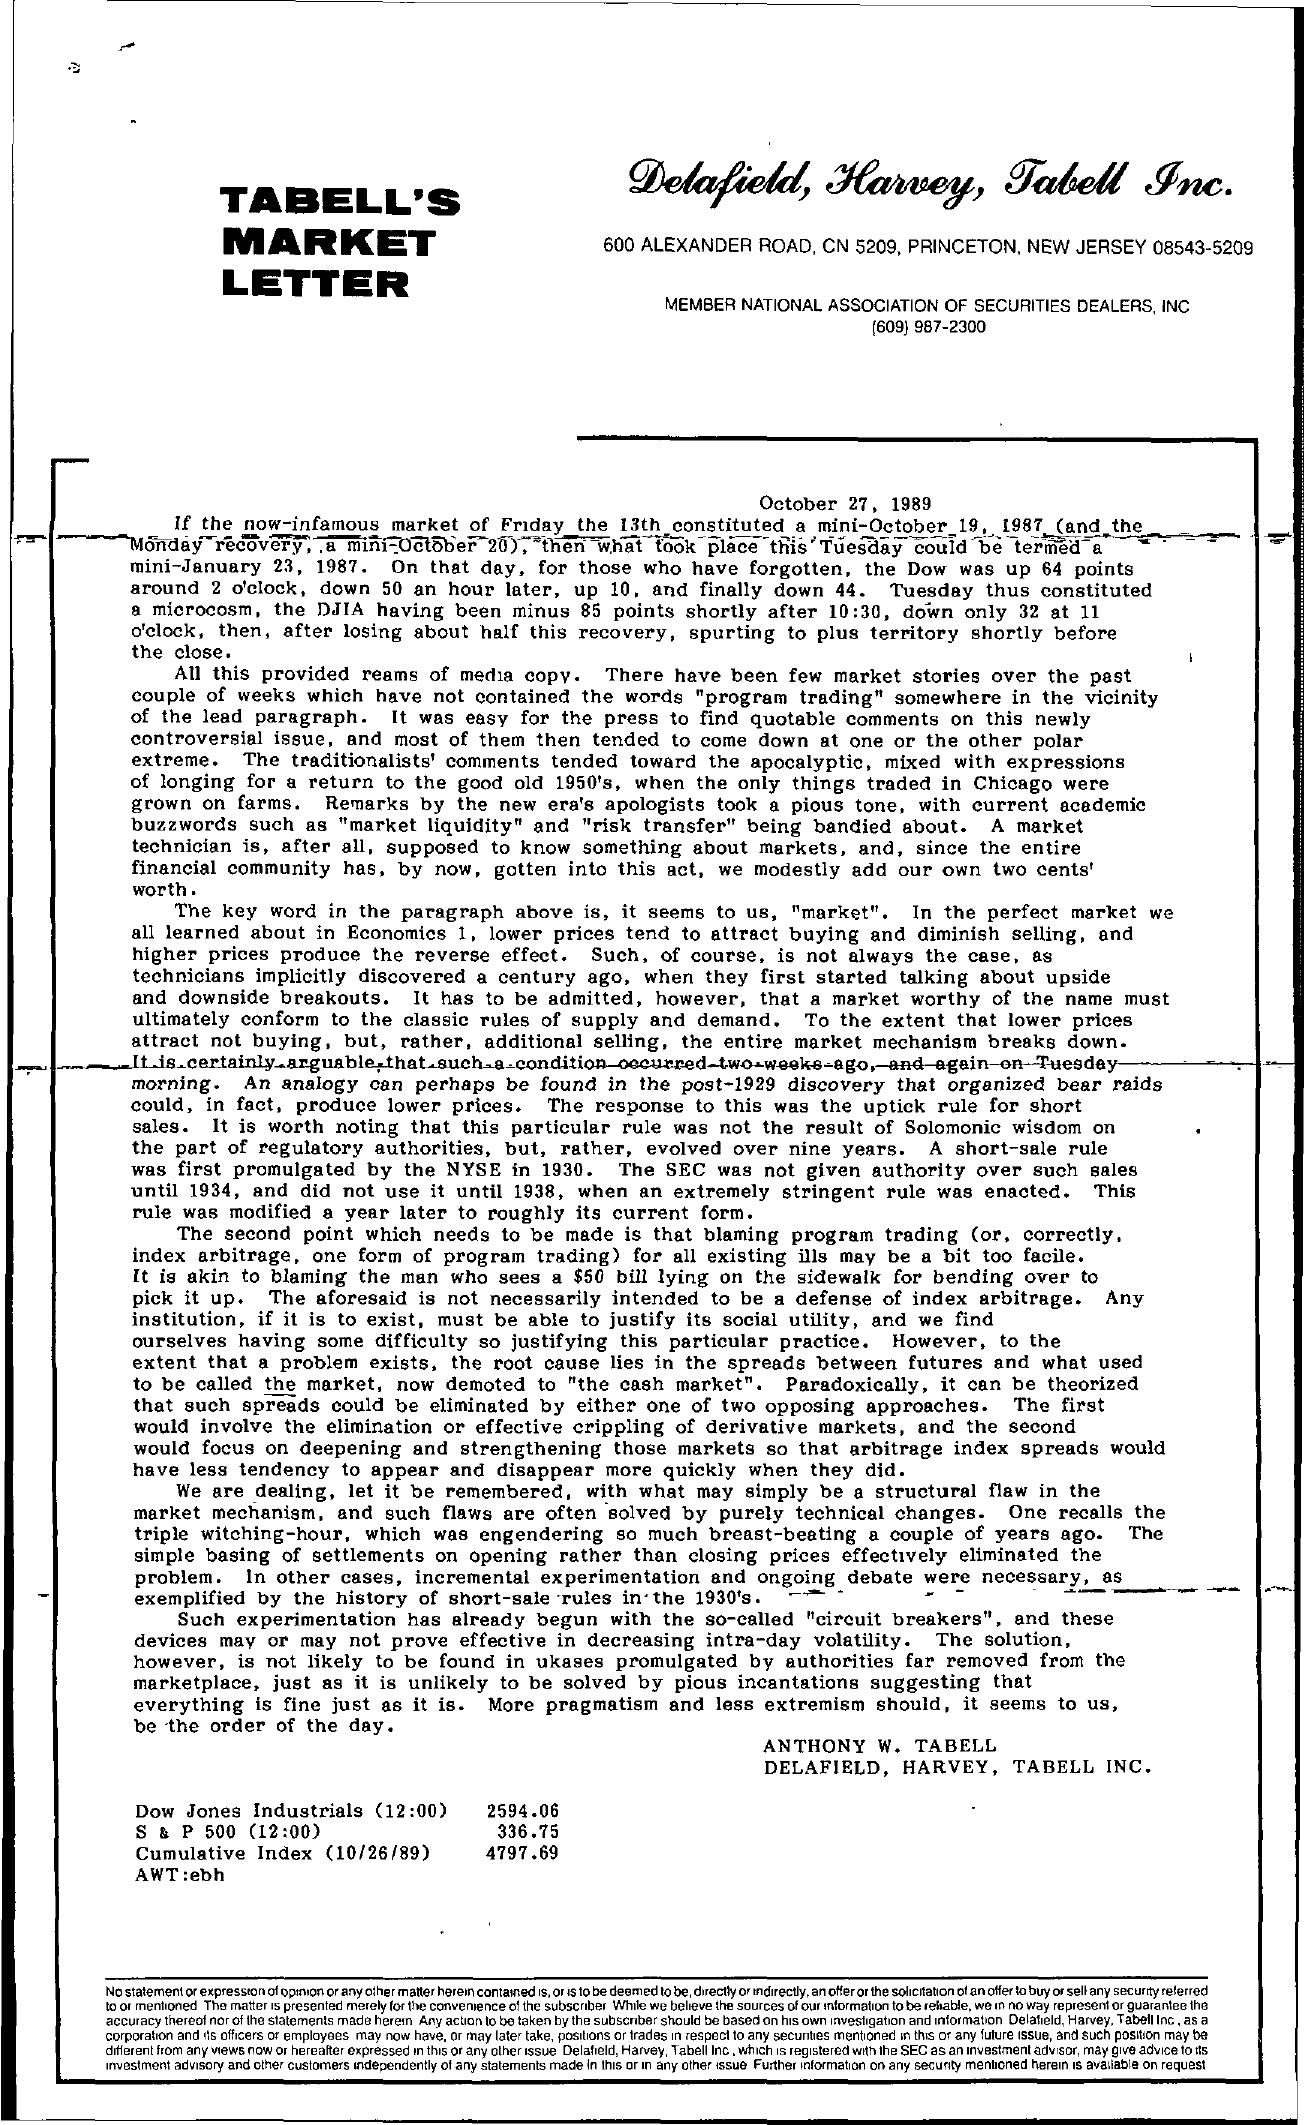 Tabell's Market Letter - October 27, 1989